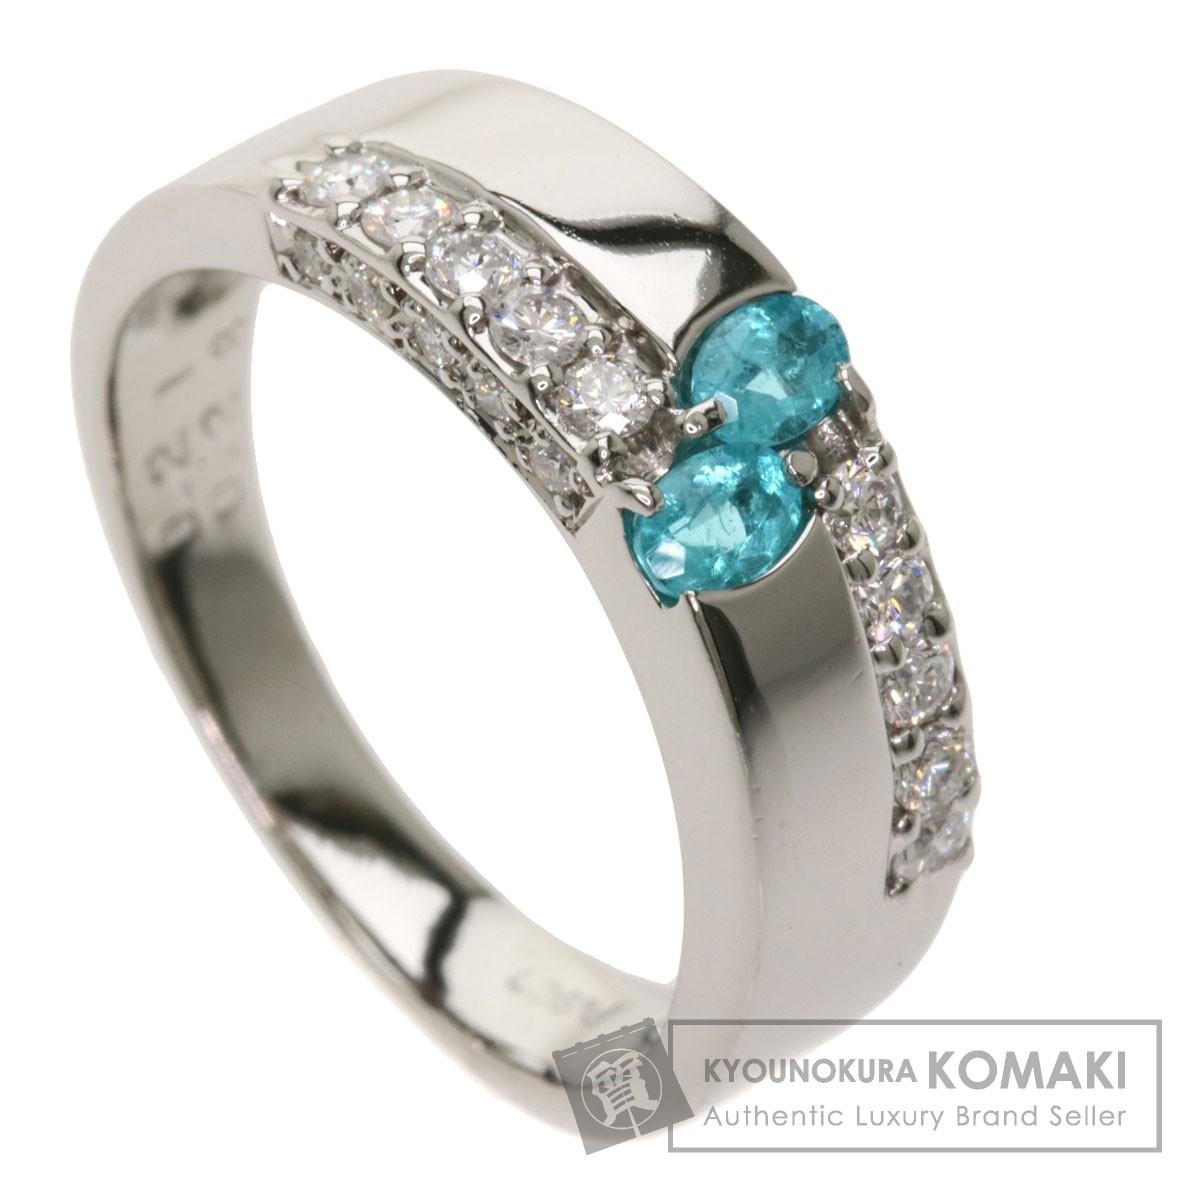 0.21ct パライバトルマリン ダイヤモンド リング・指輪 プラチナPT900 5.8g レディース 【中古】